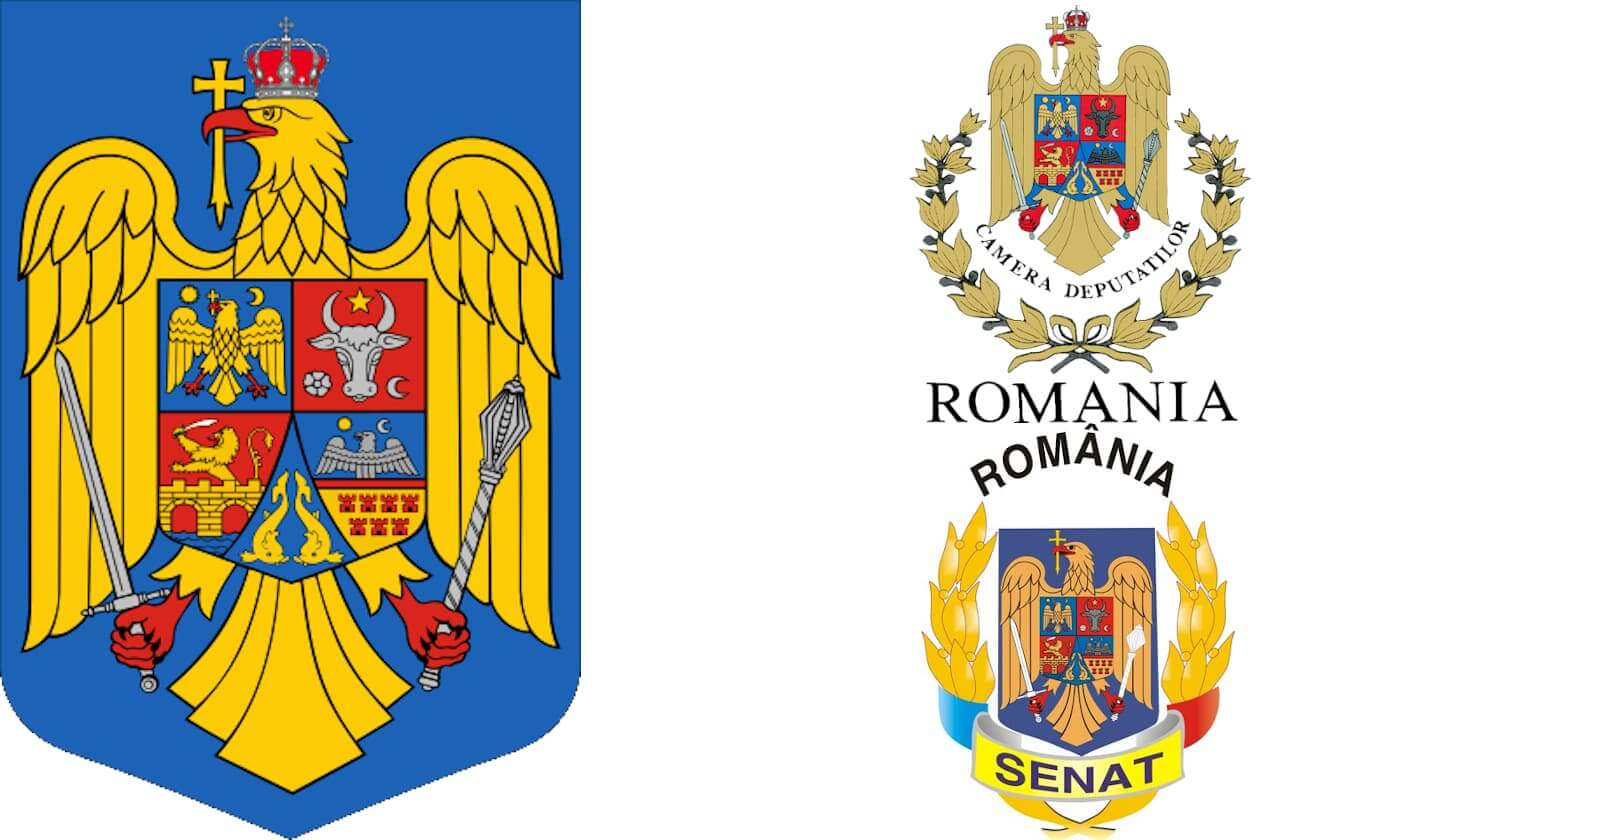 https://ziarul.romania-rationala.ro/control/articole/articole/parlamentul-romaniei-banner_5.jpg